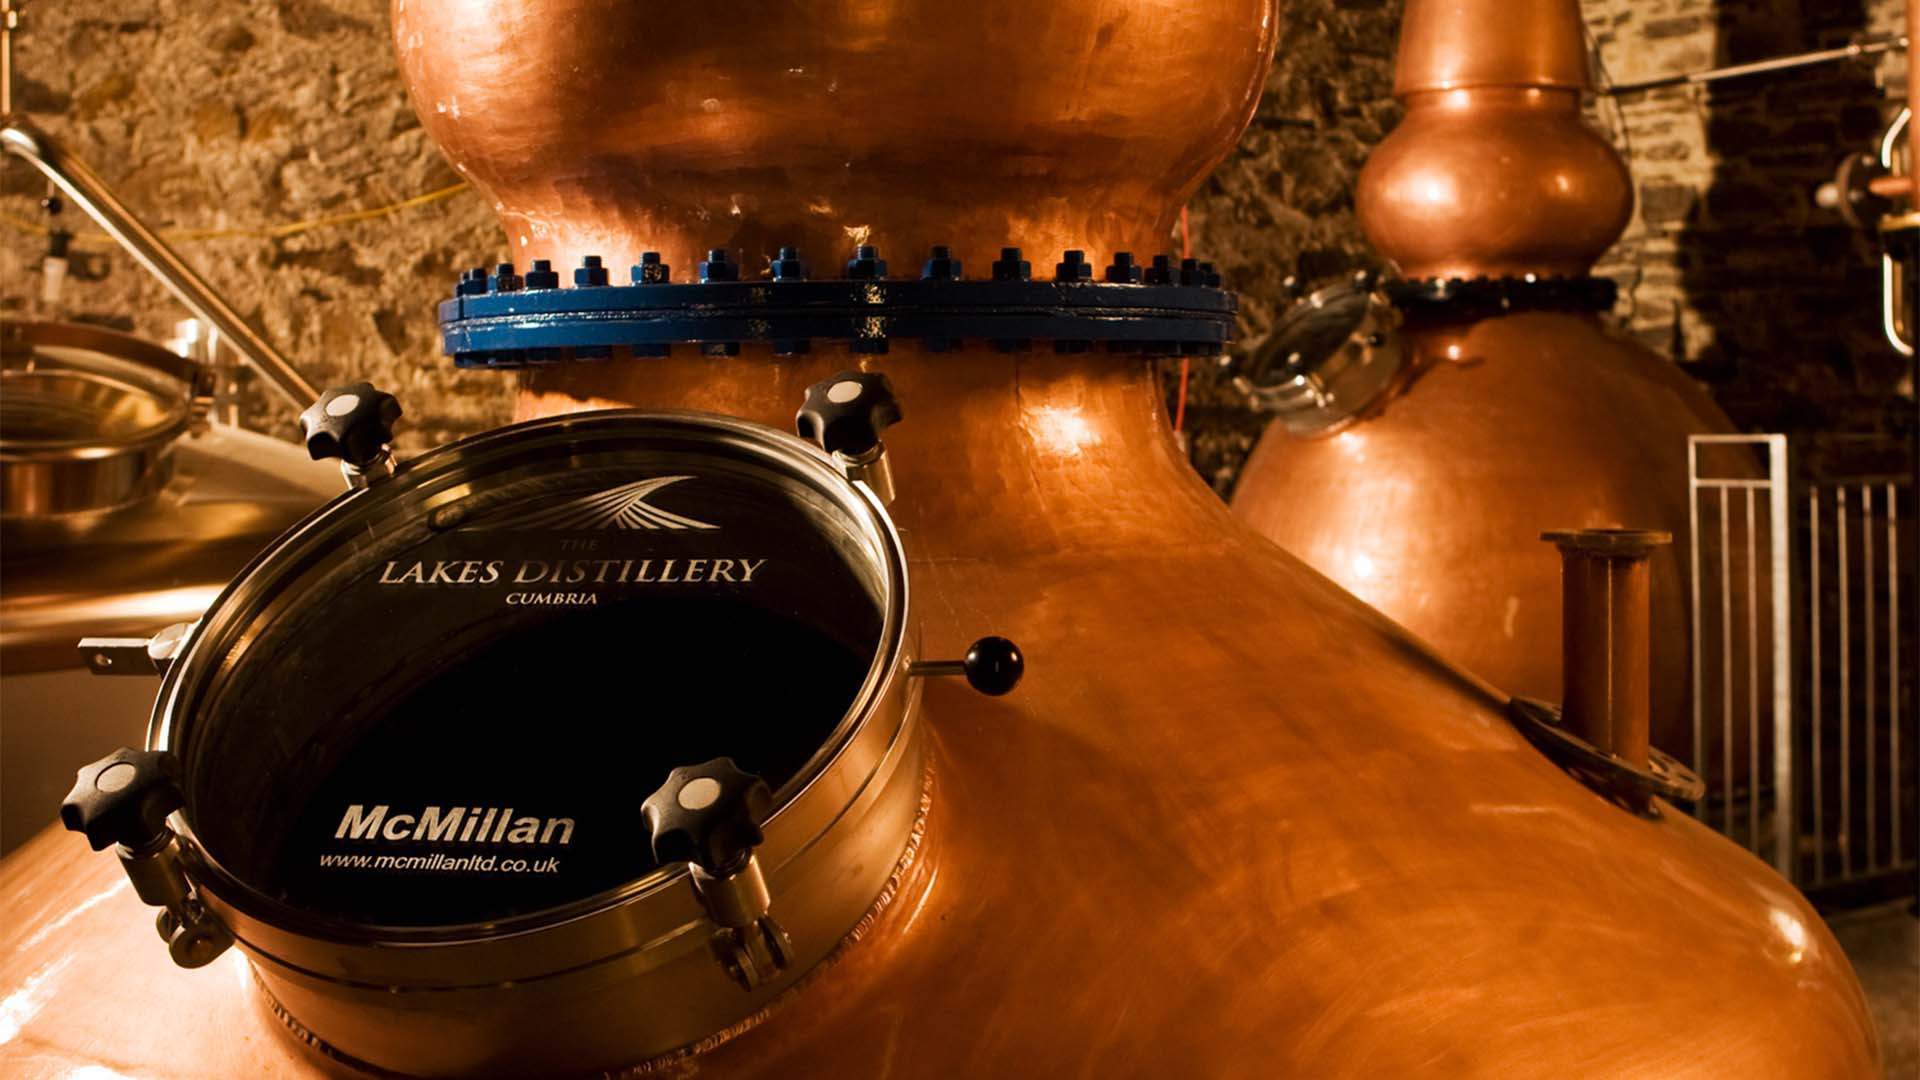 The still at Lakes Distillery, Cumbria